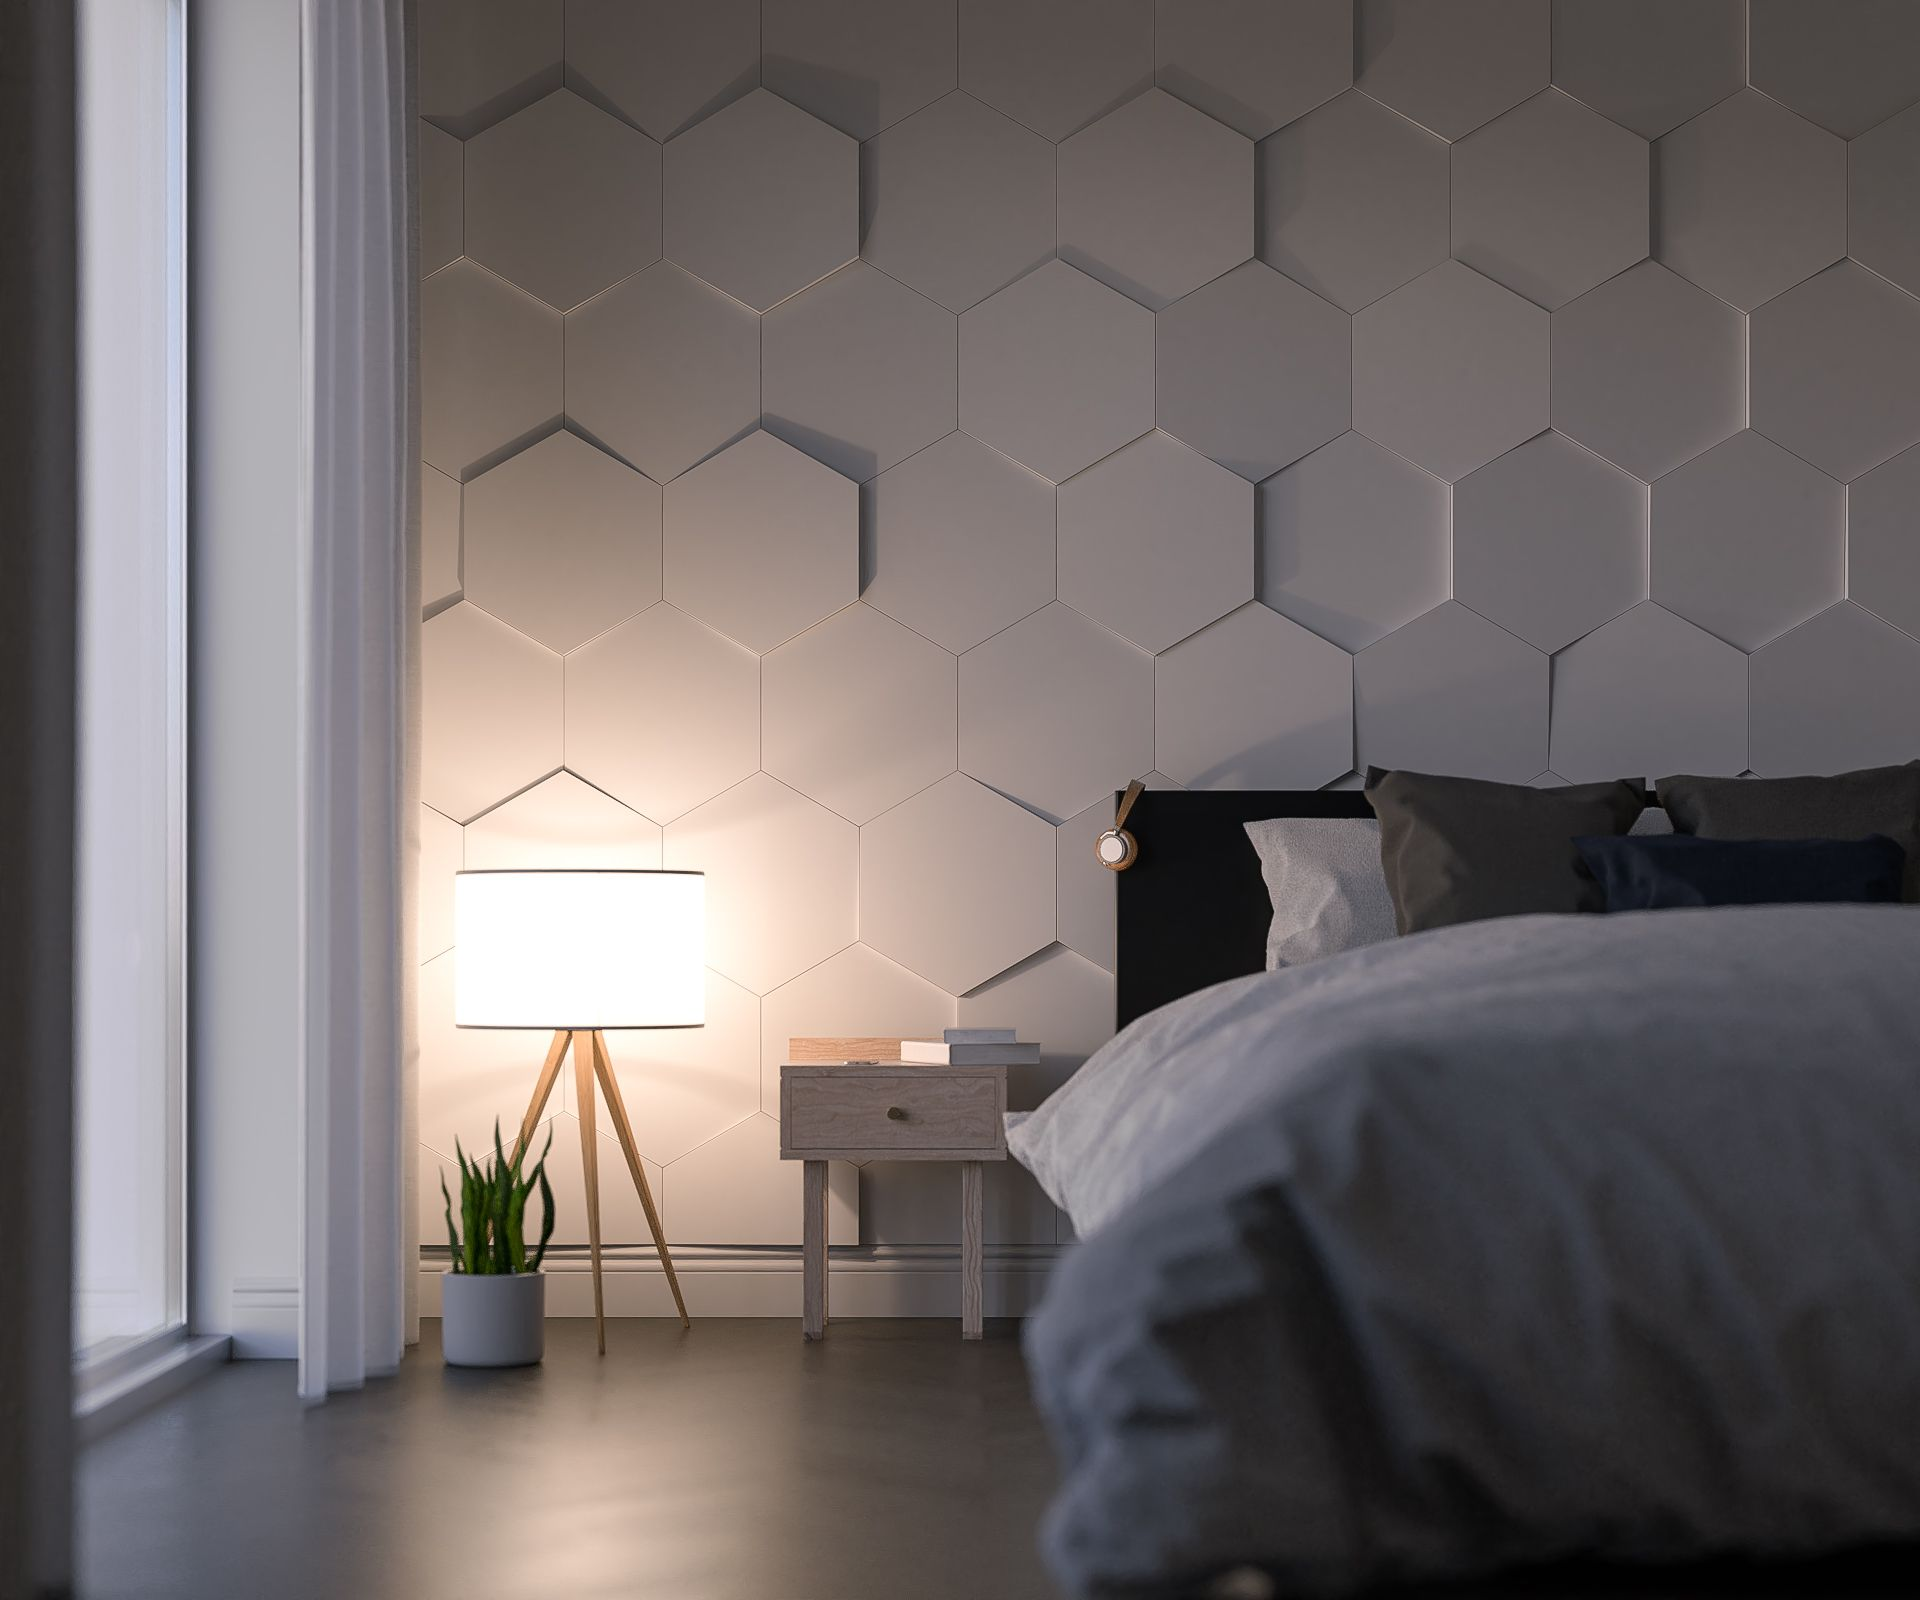 D Interiors Mała Sypialnia: Hexagon Slope By Kalithea #panels #panele #3Dpanels